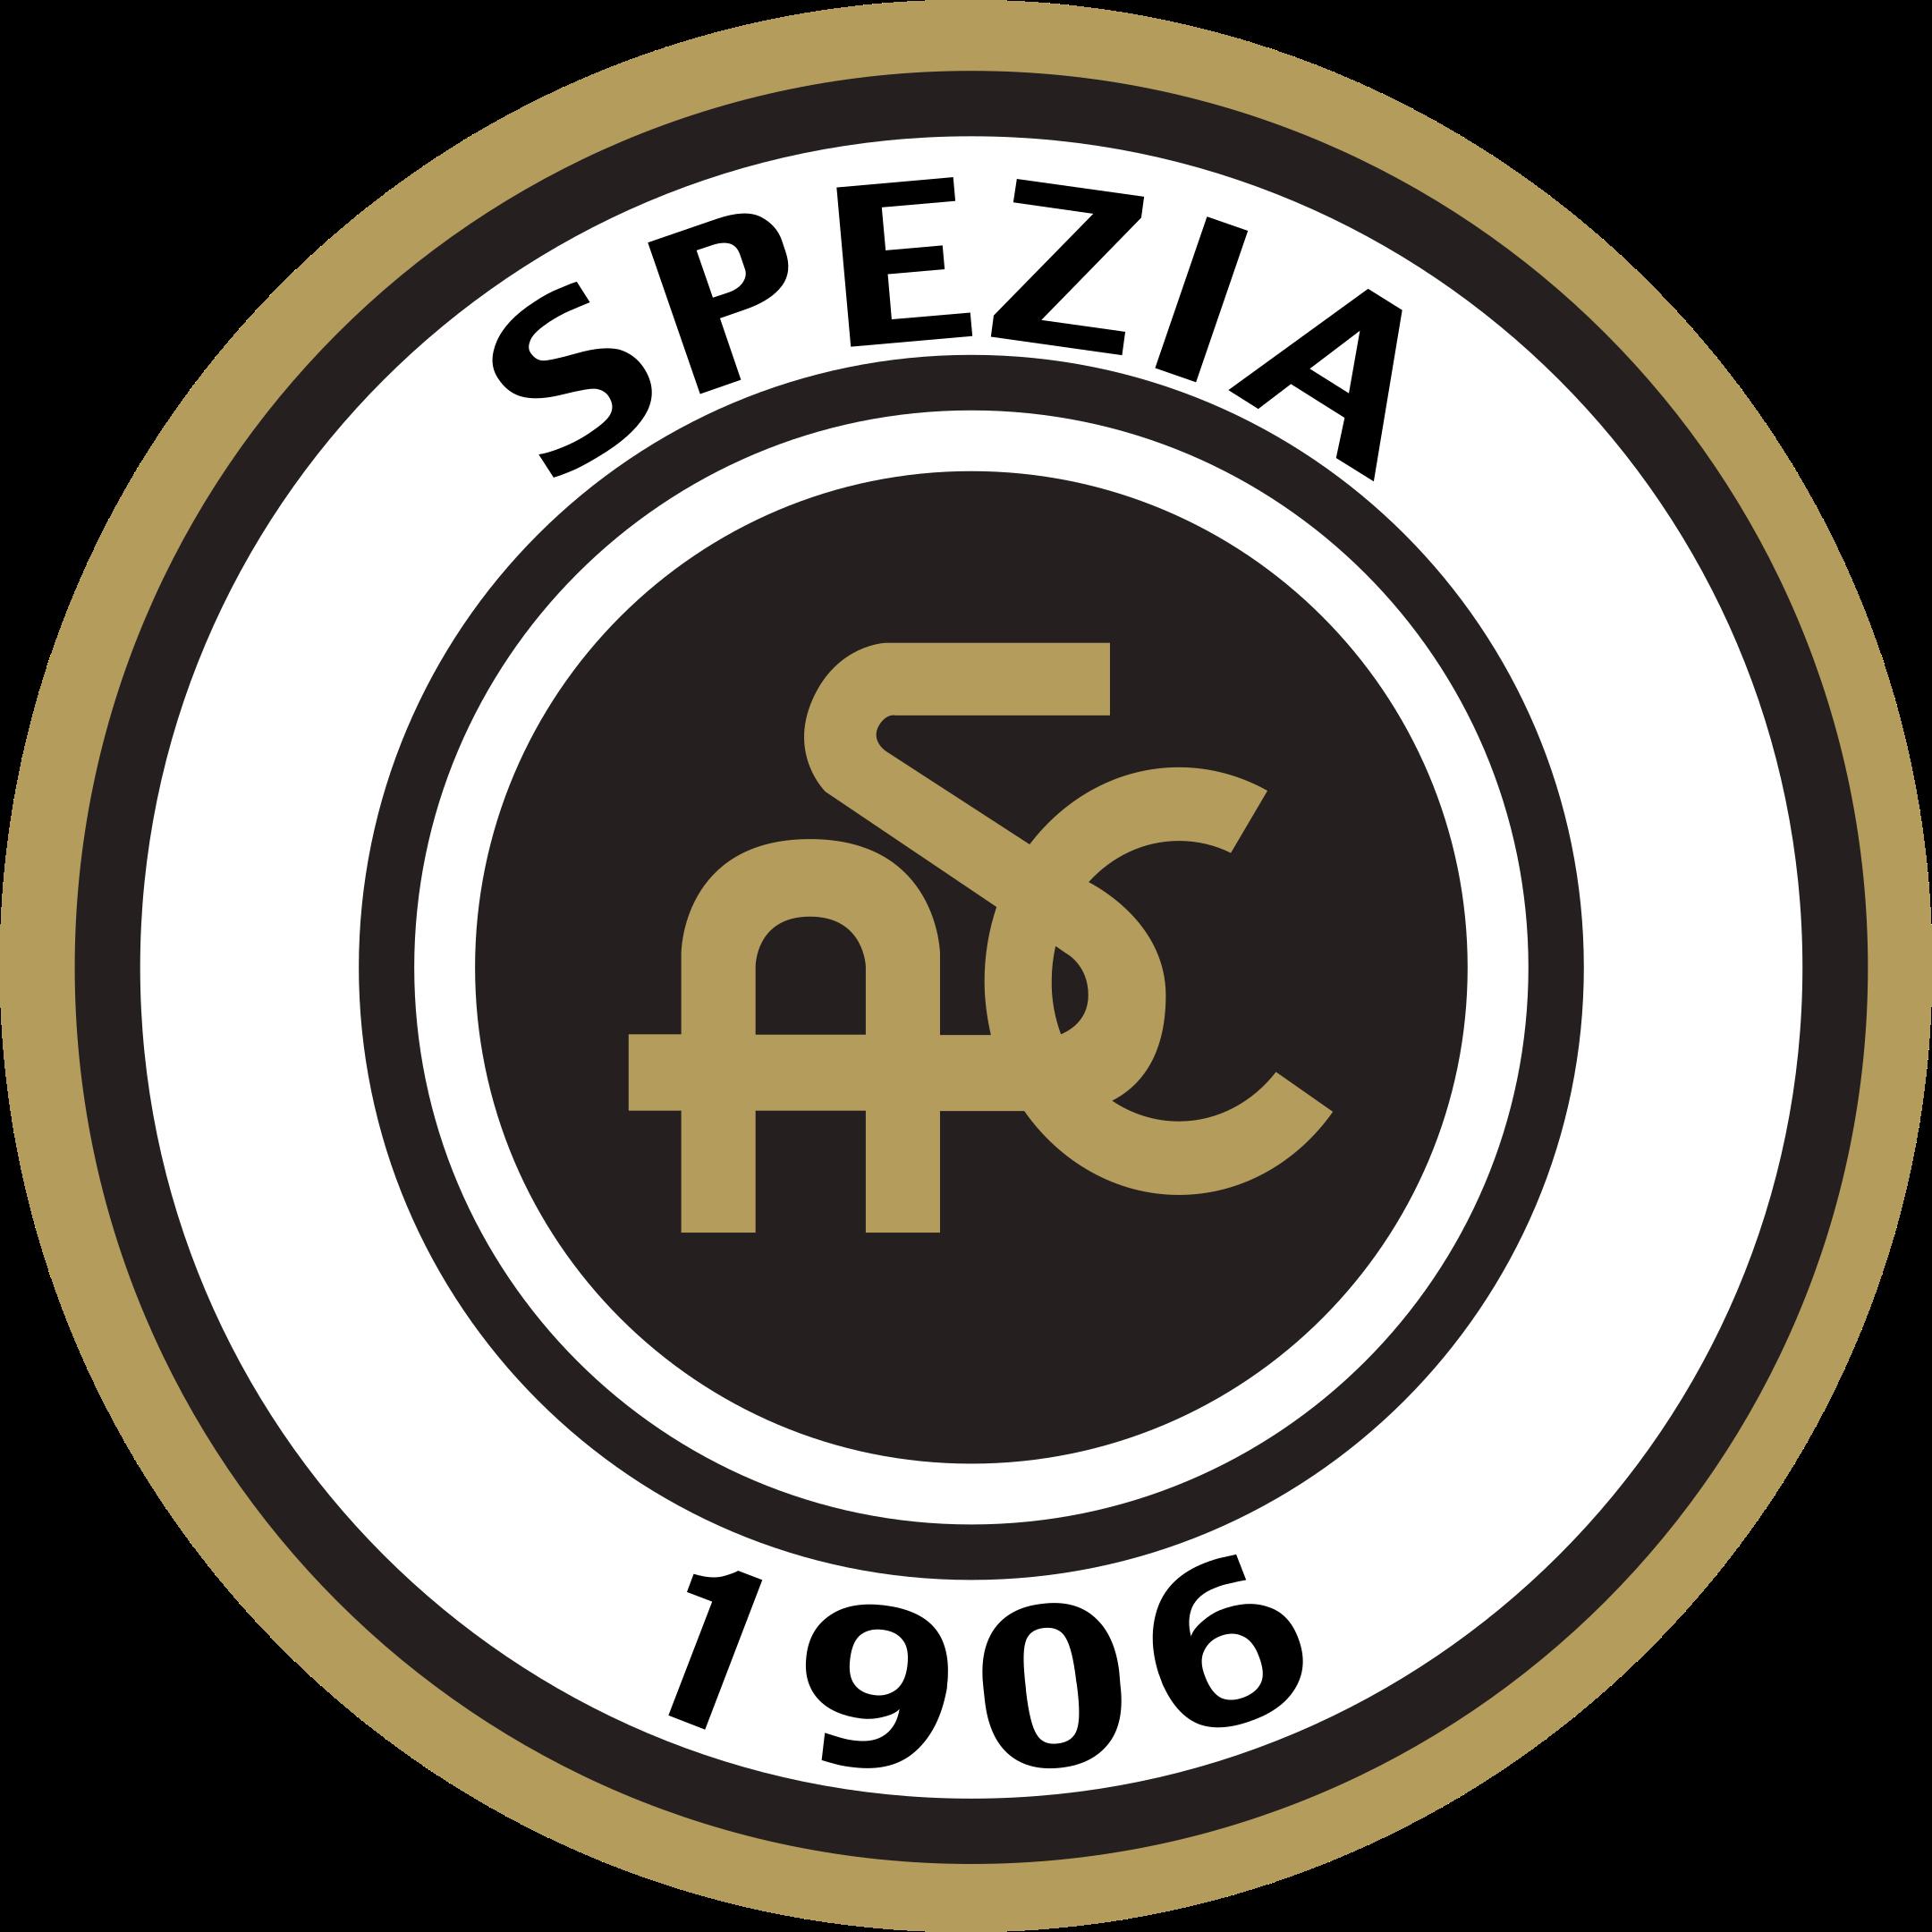 ac spezia logo 1 - AC Spezia Logo